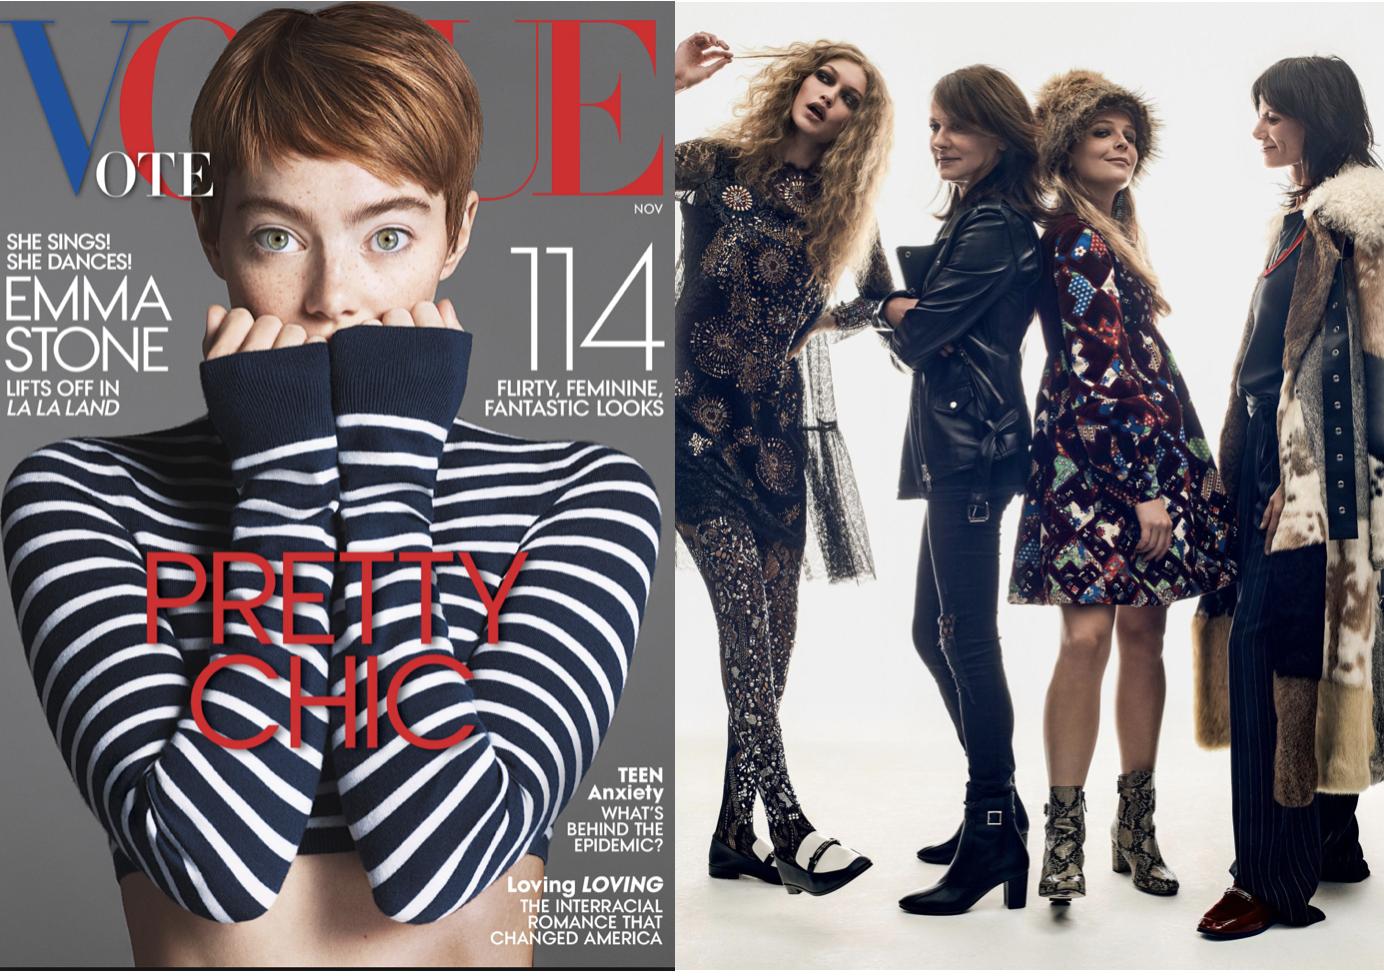 VOGUE - CFDA/ Vogue Fashion Fund FinalistsGigi Hadid and Maggie Rogersphoto: Gregory Harrisread more